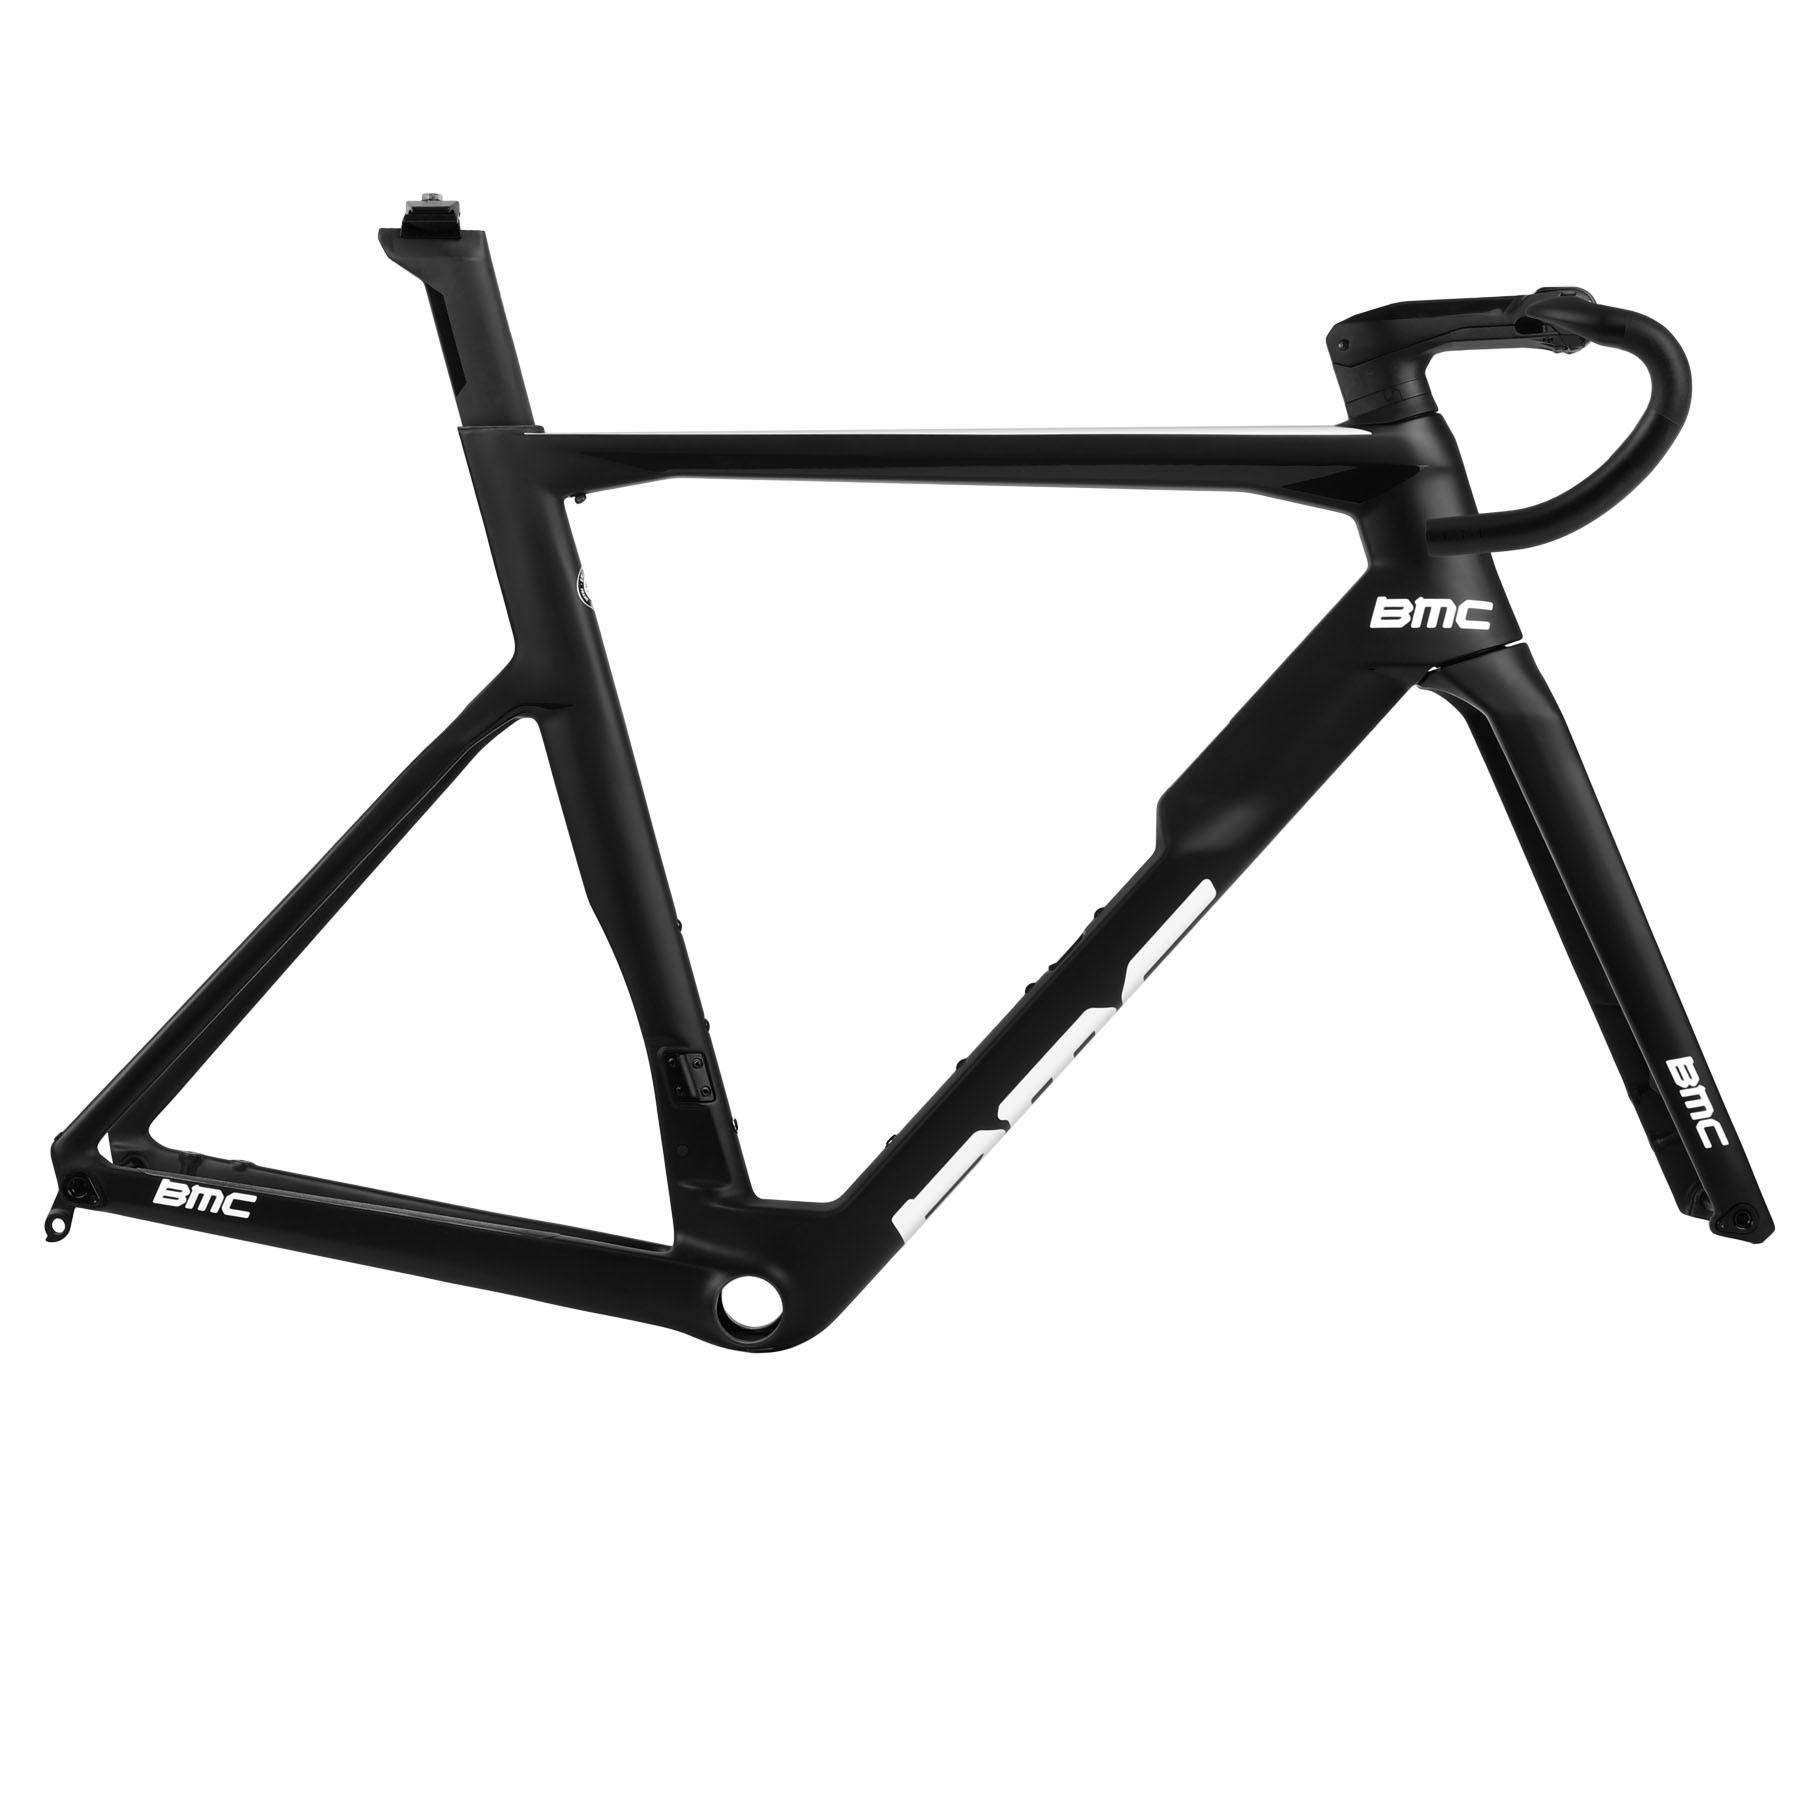 BMC TIMEMACHINE 01 ROAD MODULE Frame Set - NTT-Design - 2021 - carbon/white/black